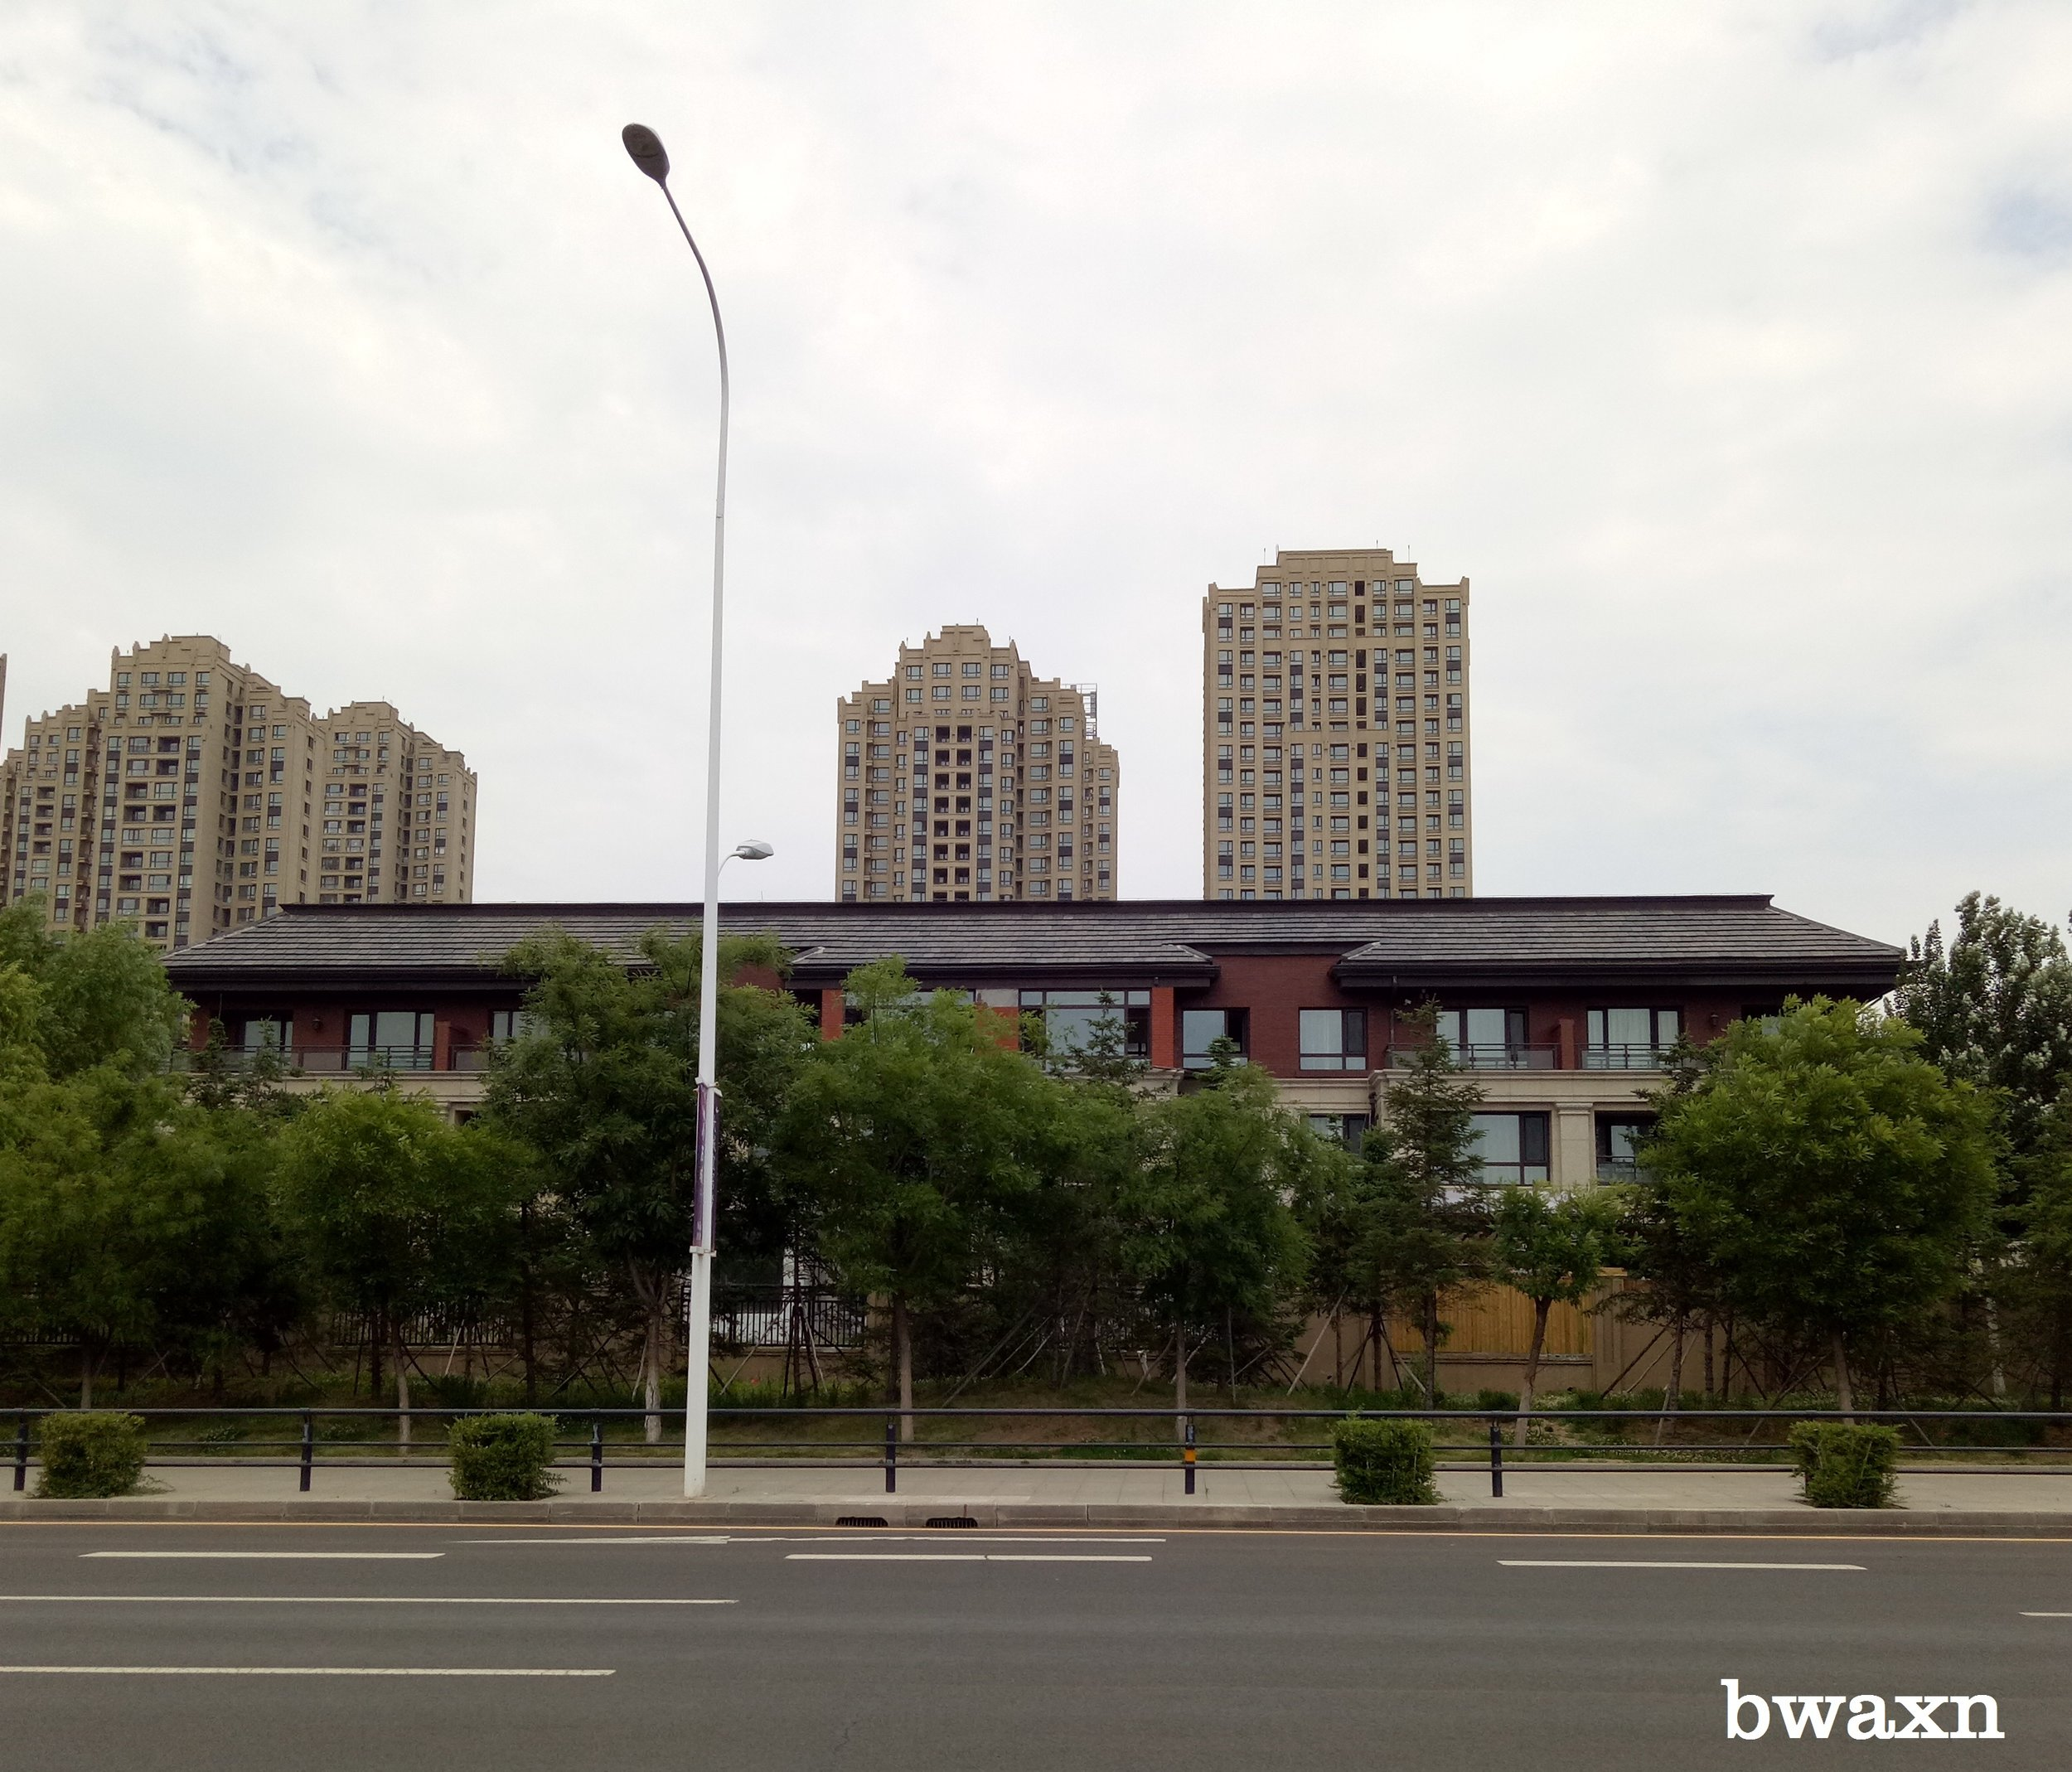 New Residential Communities